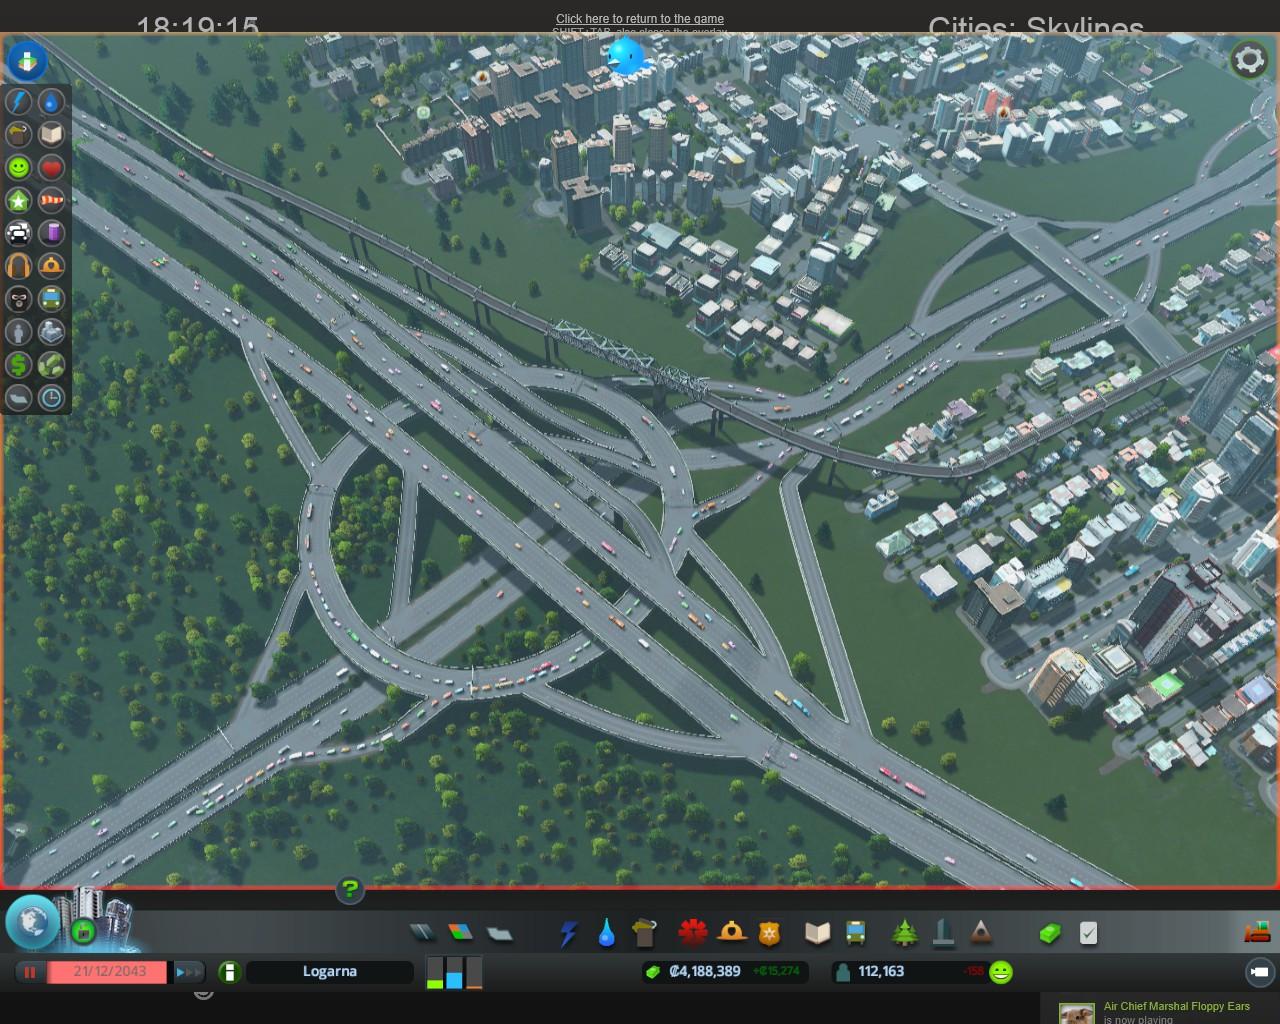 Cities Skylines No Maps